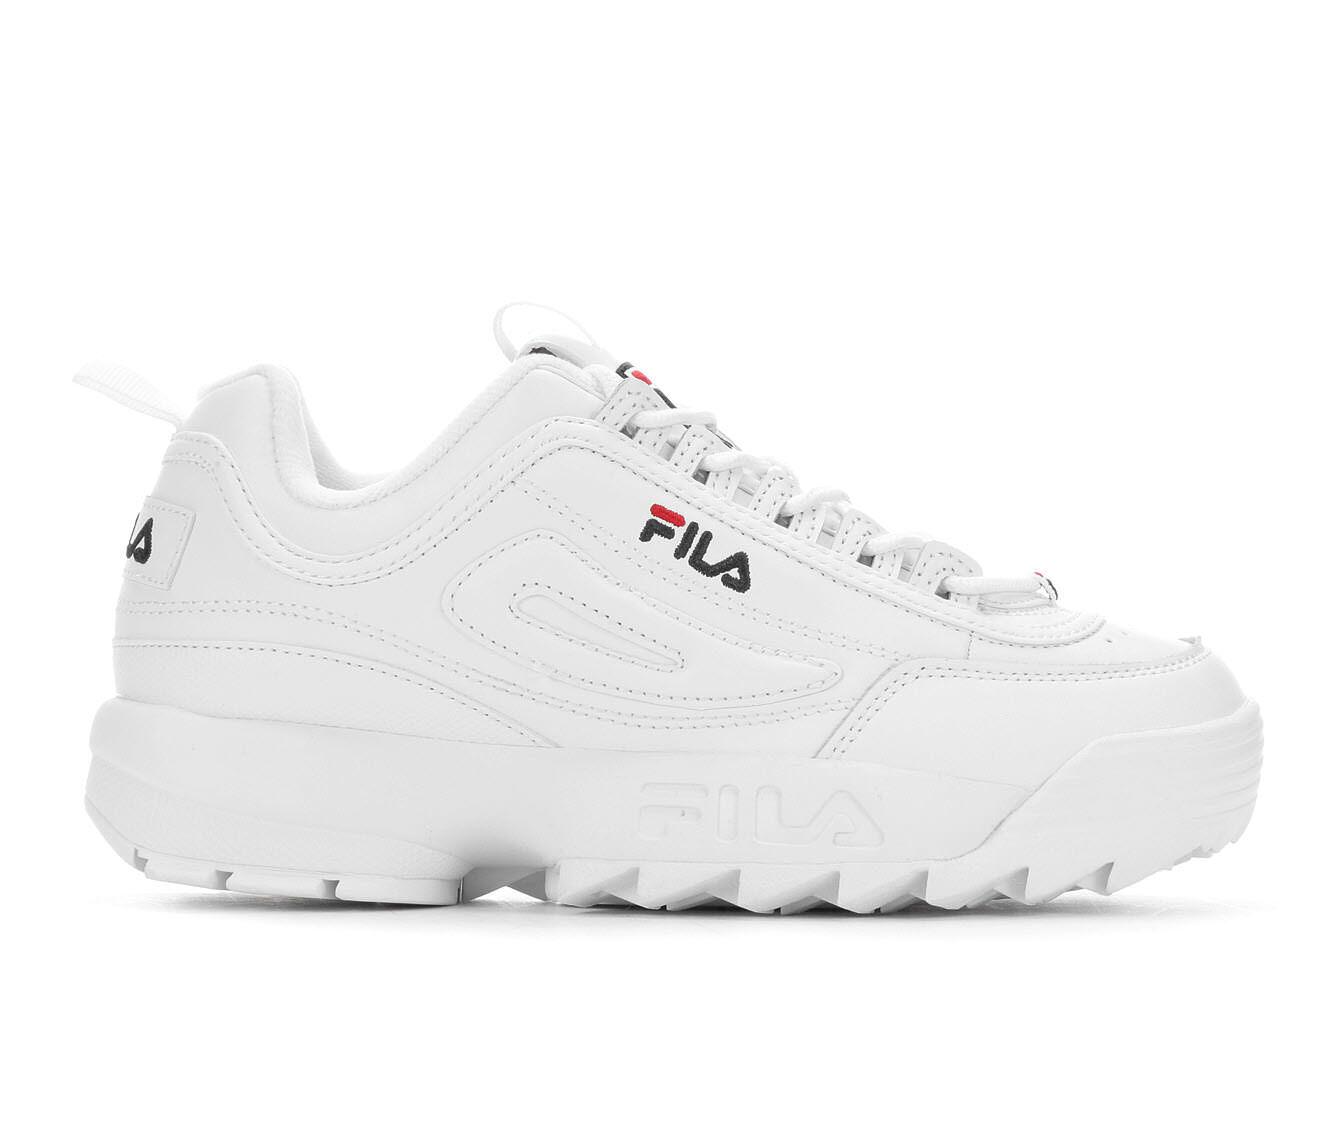 uk shoes_kd4565